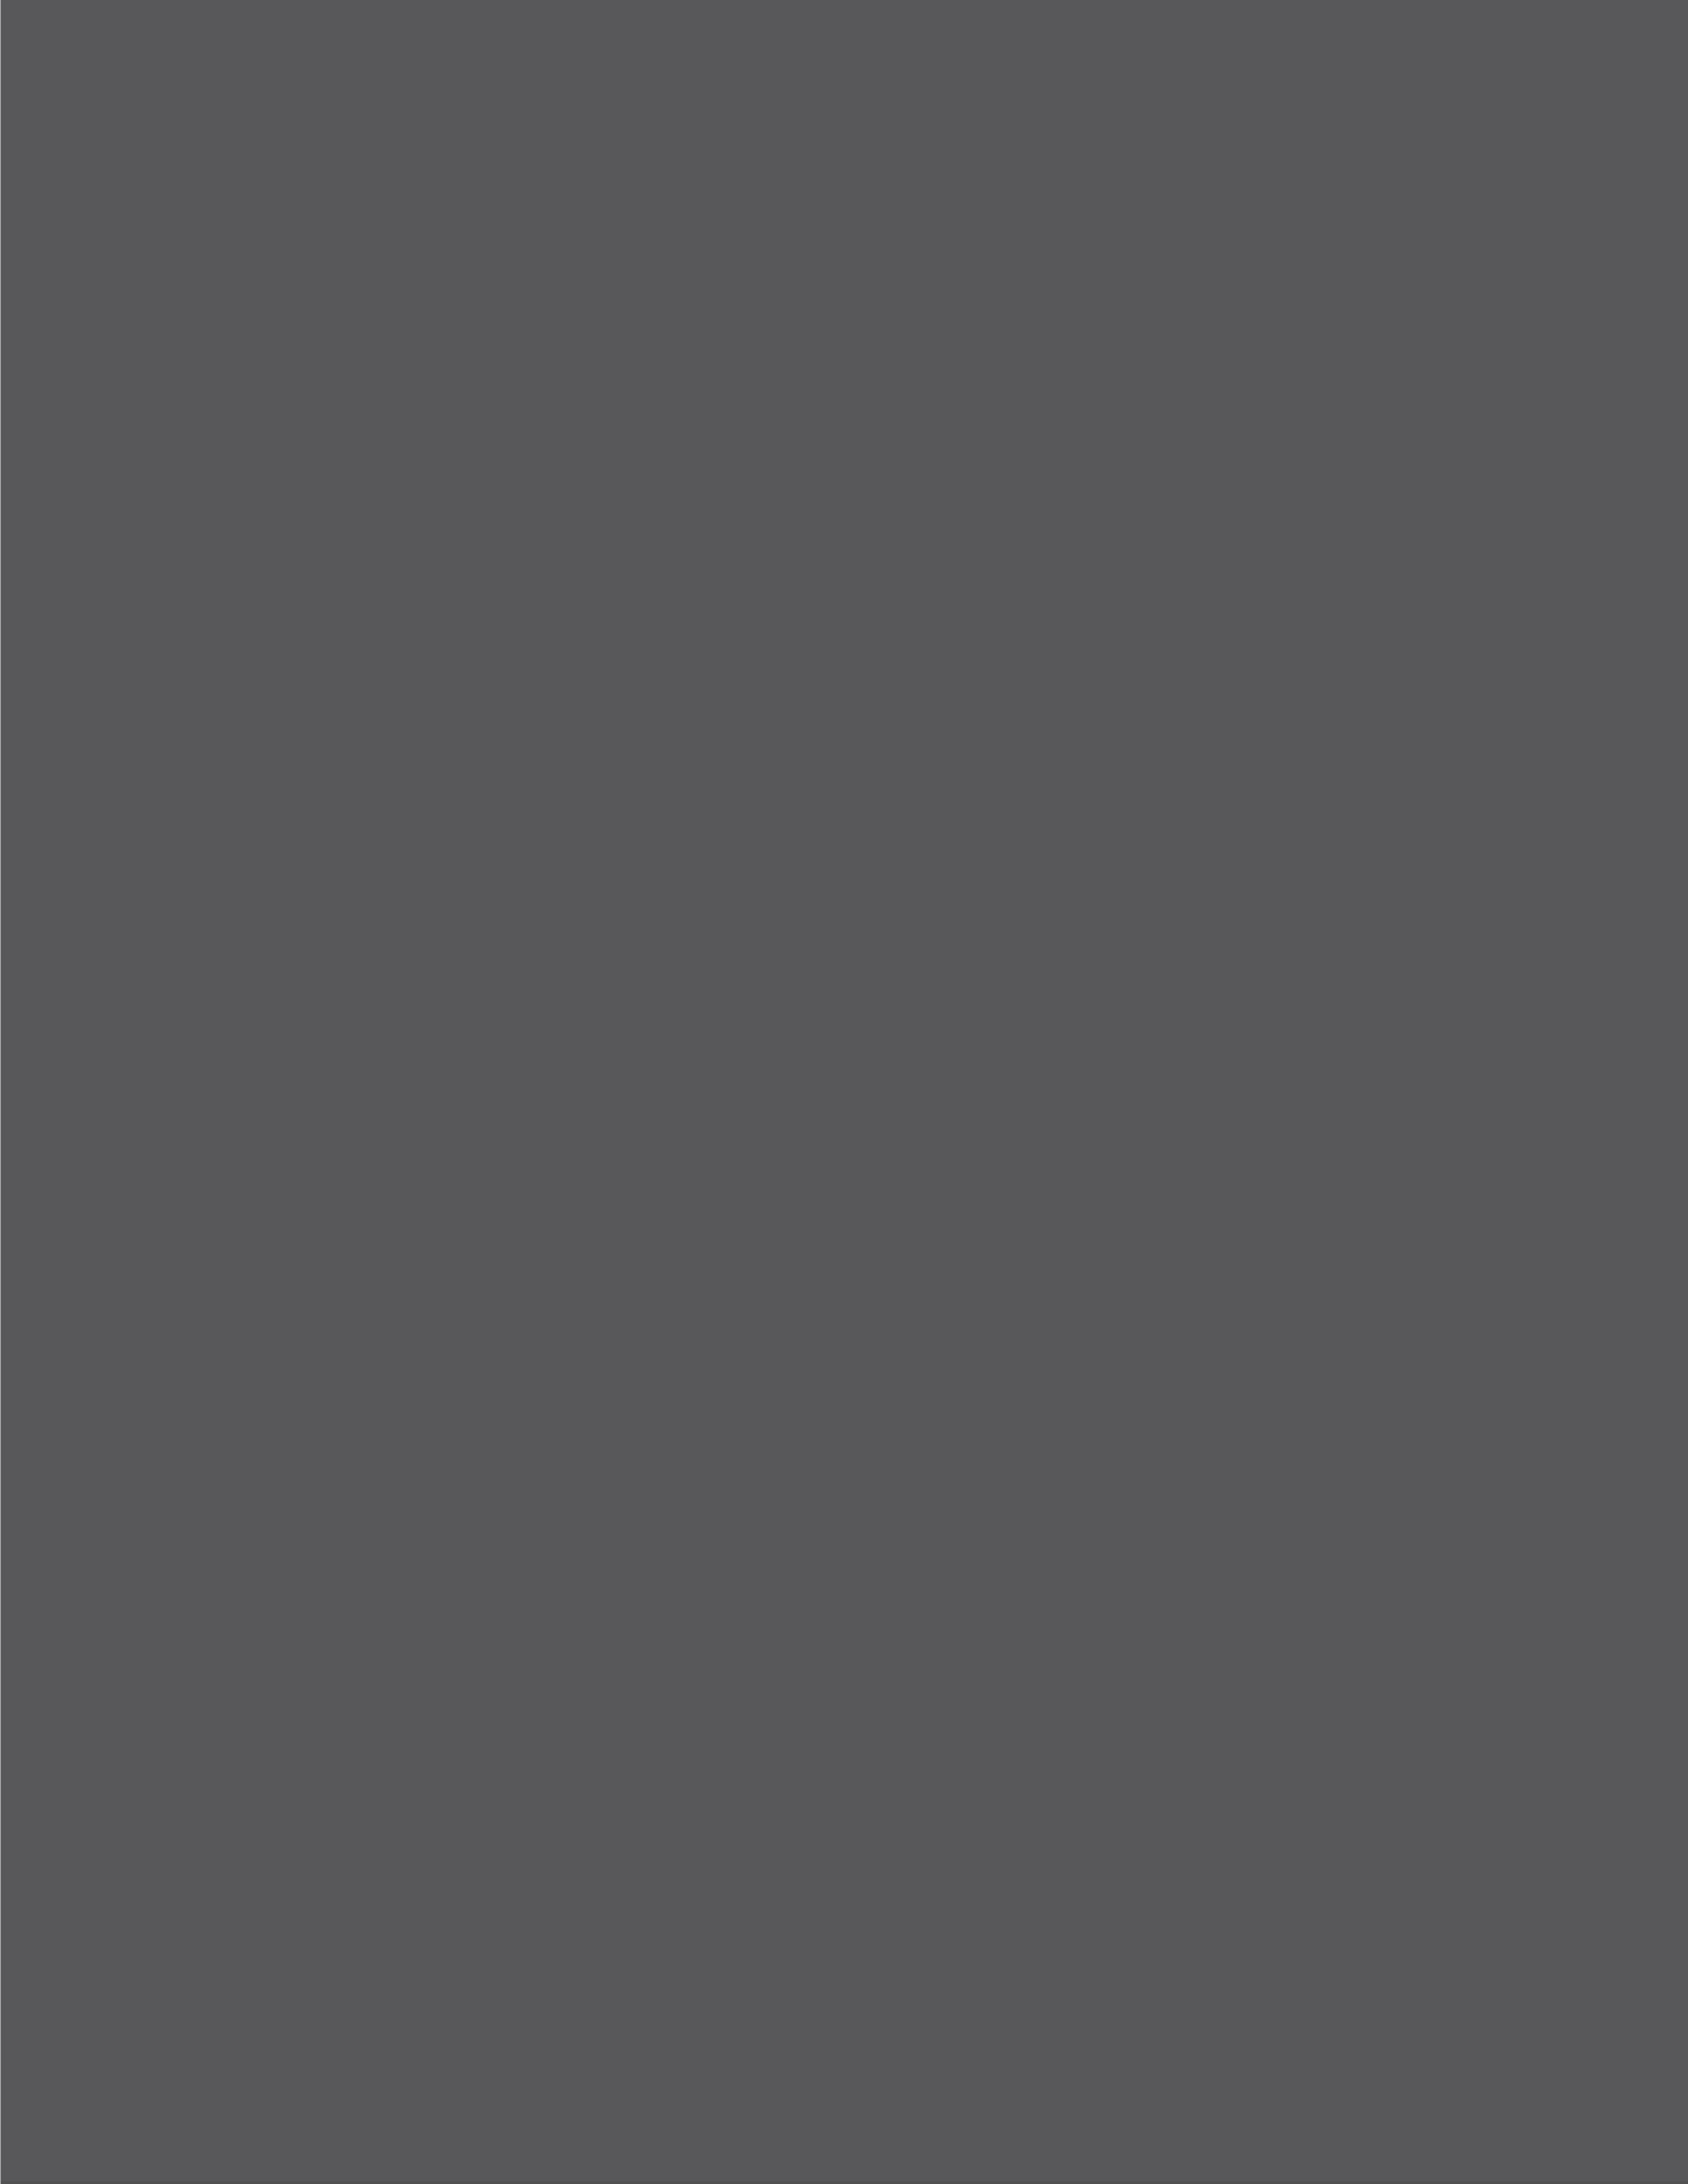 IWBI-StyleGuide2017-5.731.png